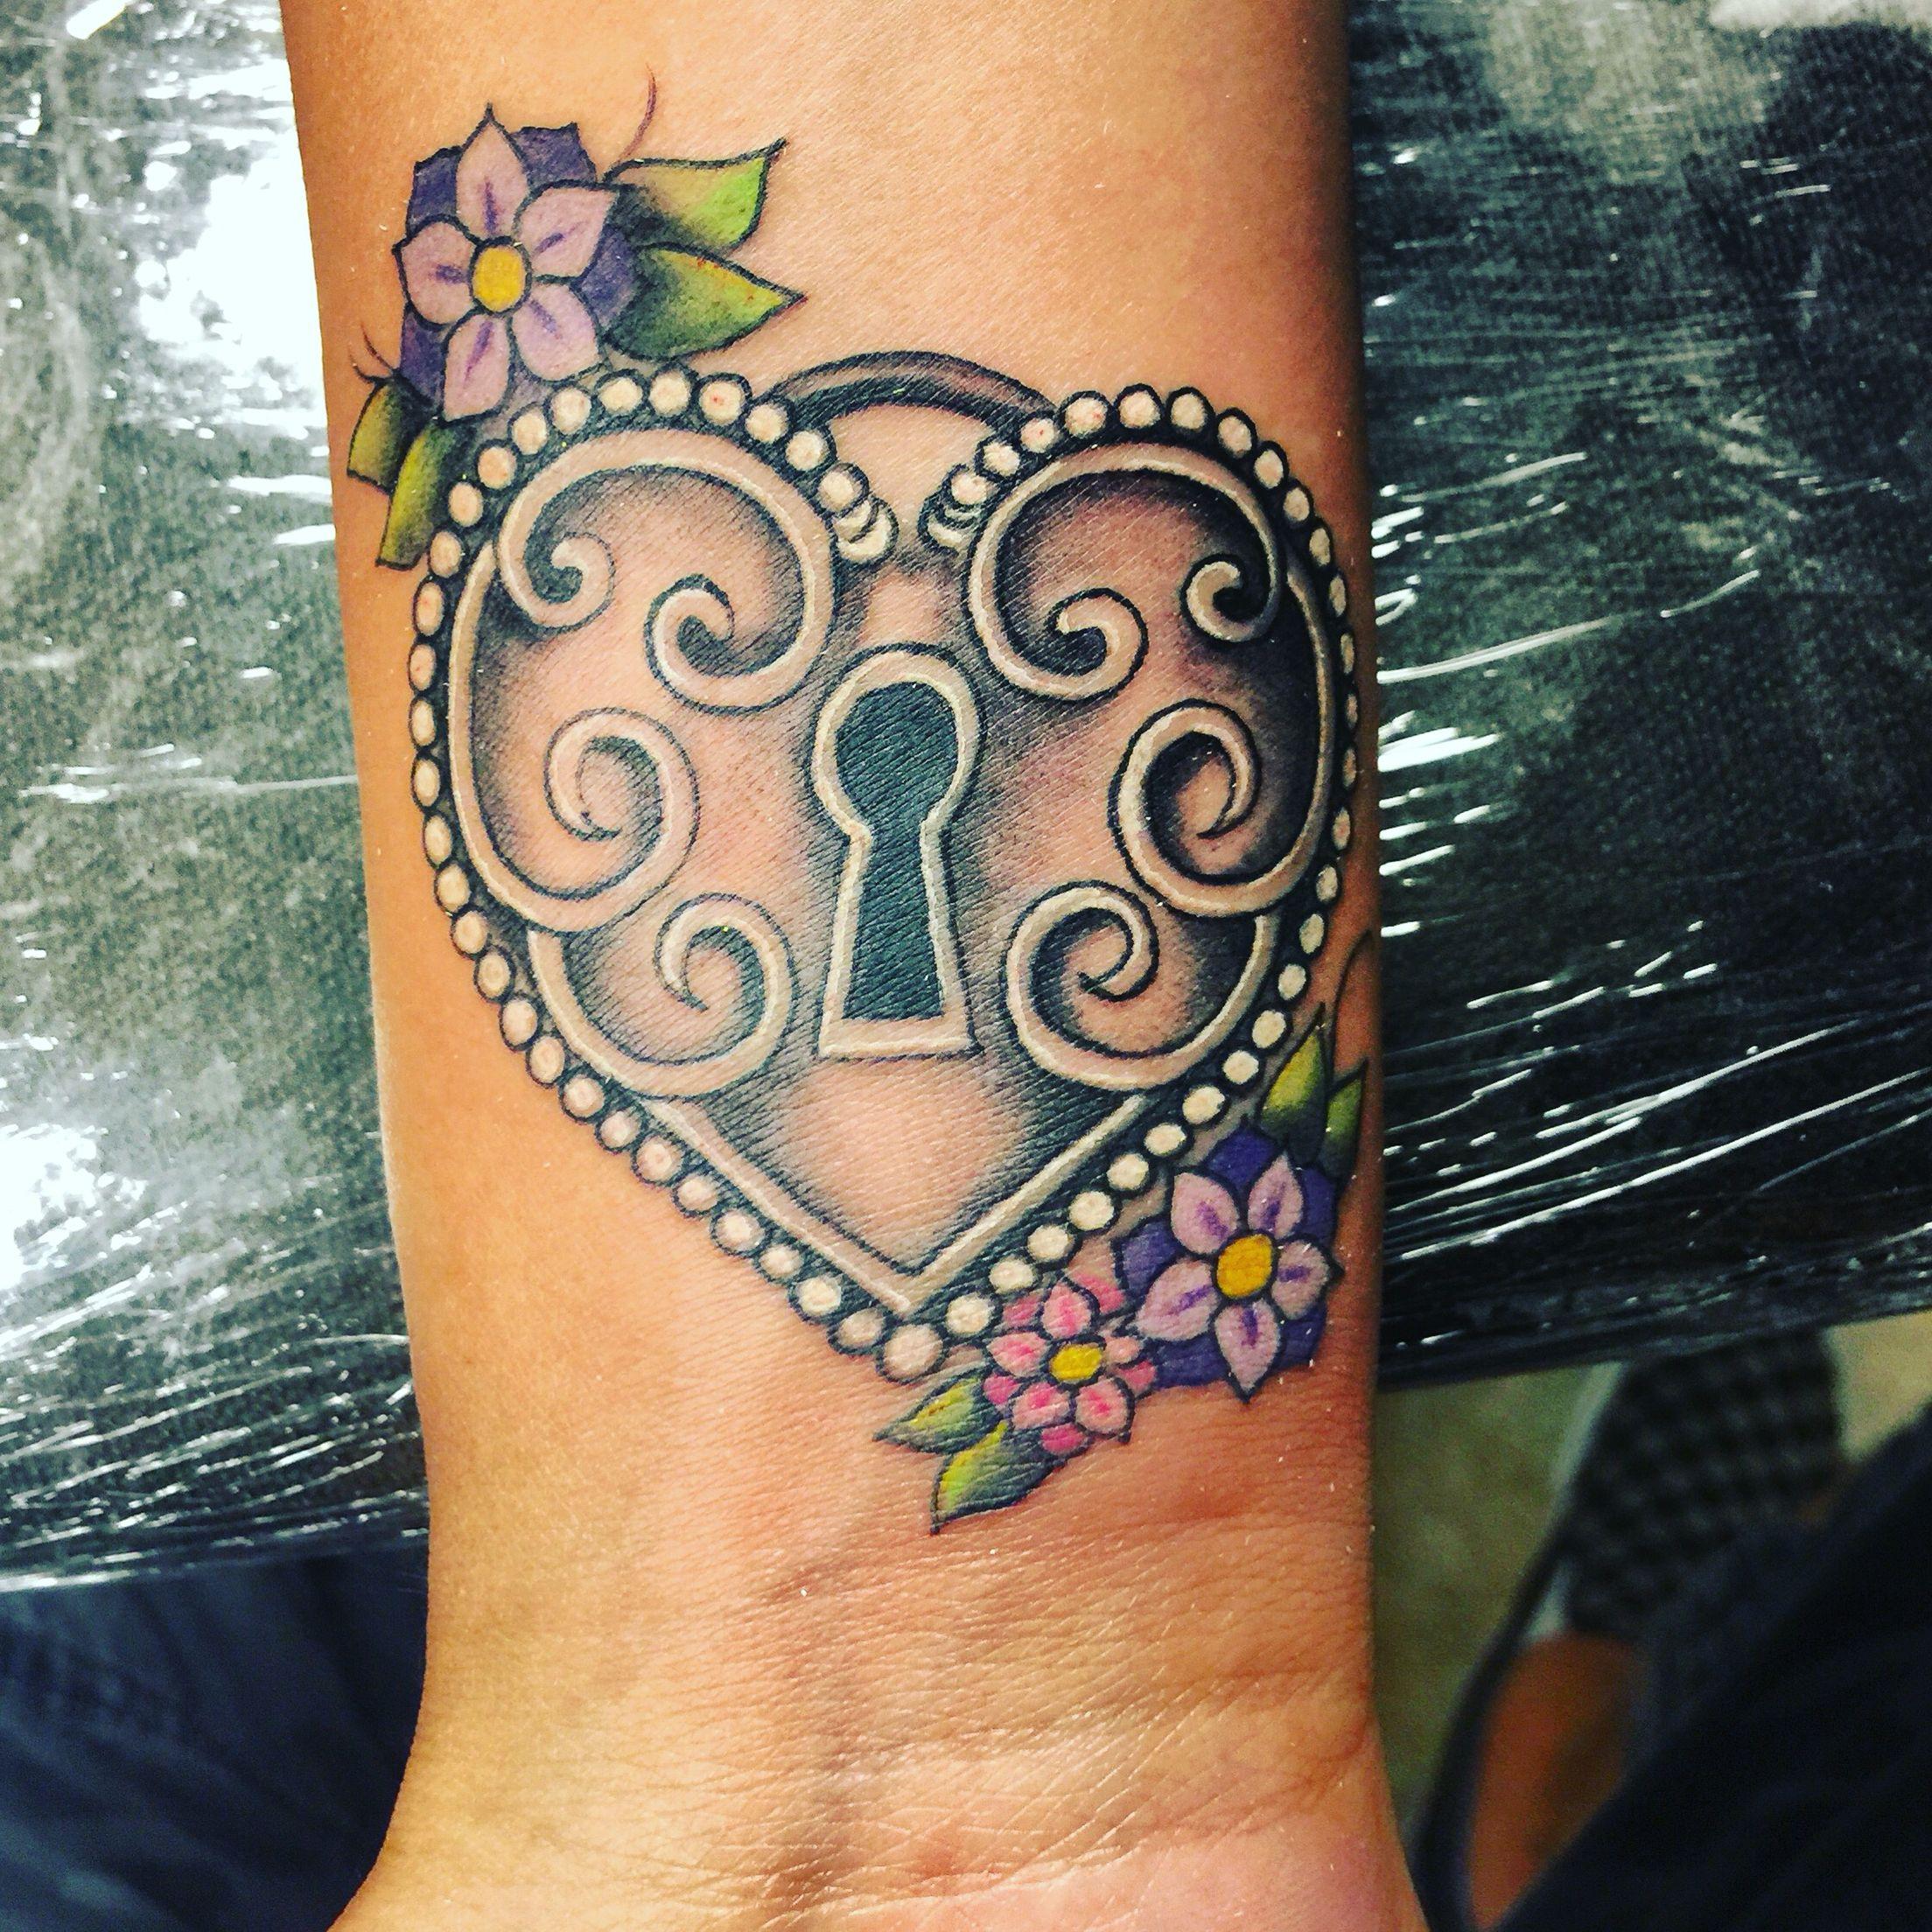 Name tattoo designs ankle wrist heart locket tattoo with flowers  tattoo  pinterest  locket